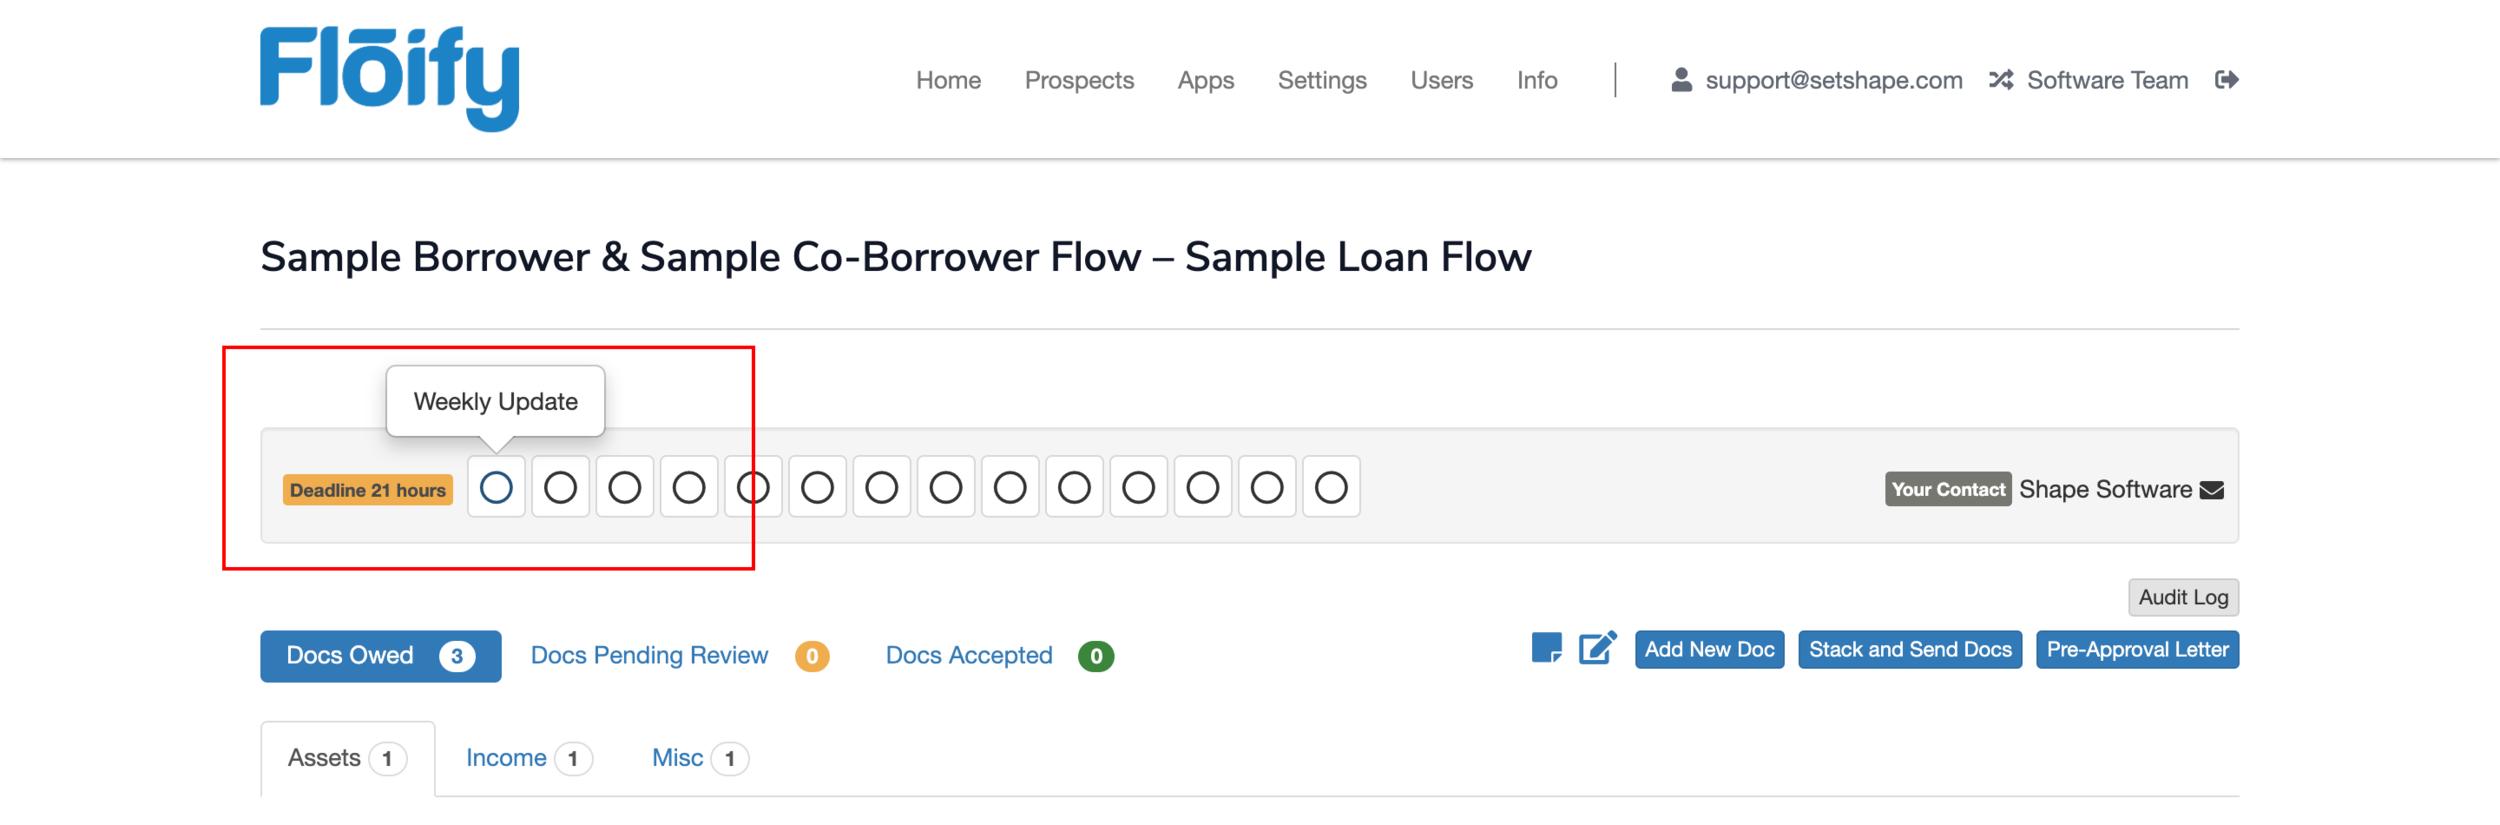 Step 6:  Click on a Floify Milestone.